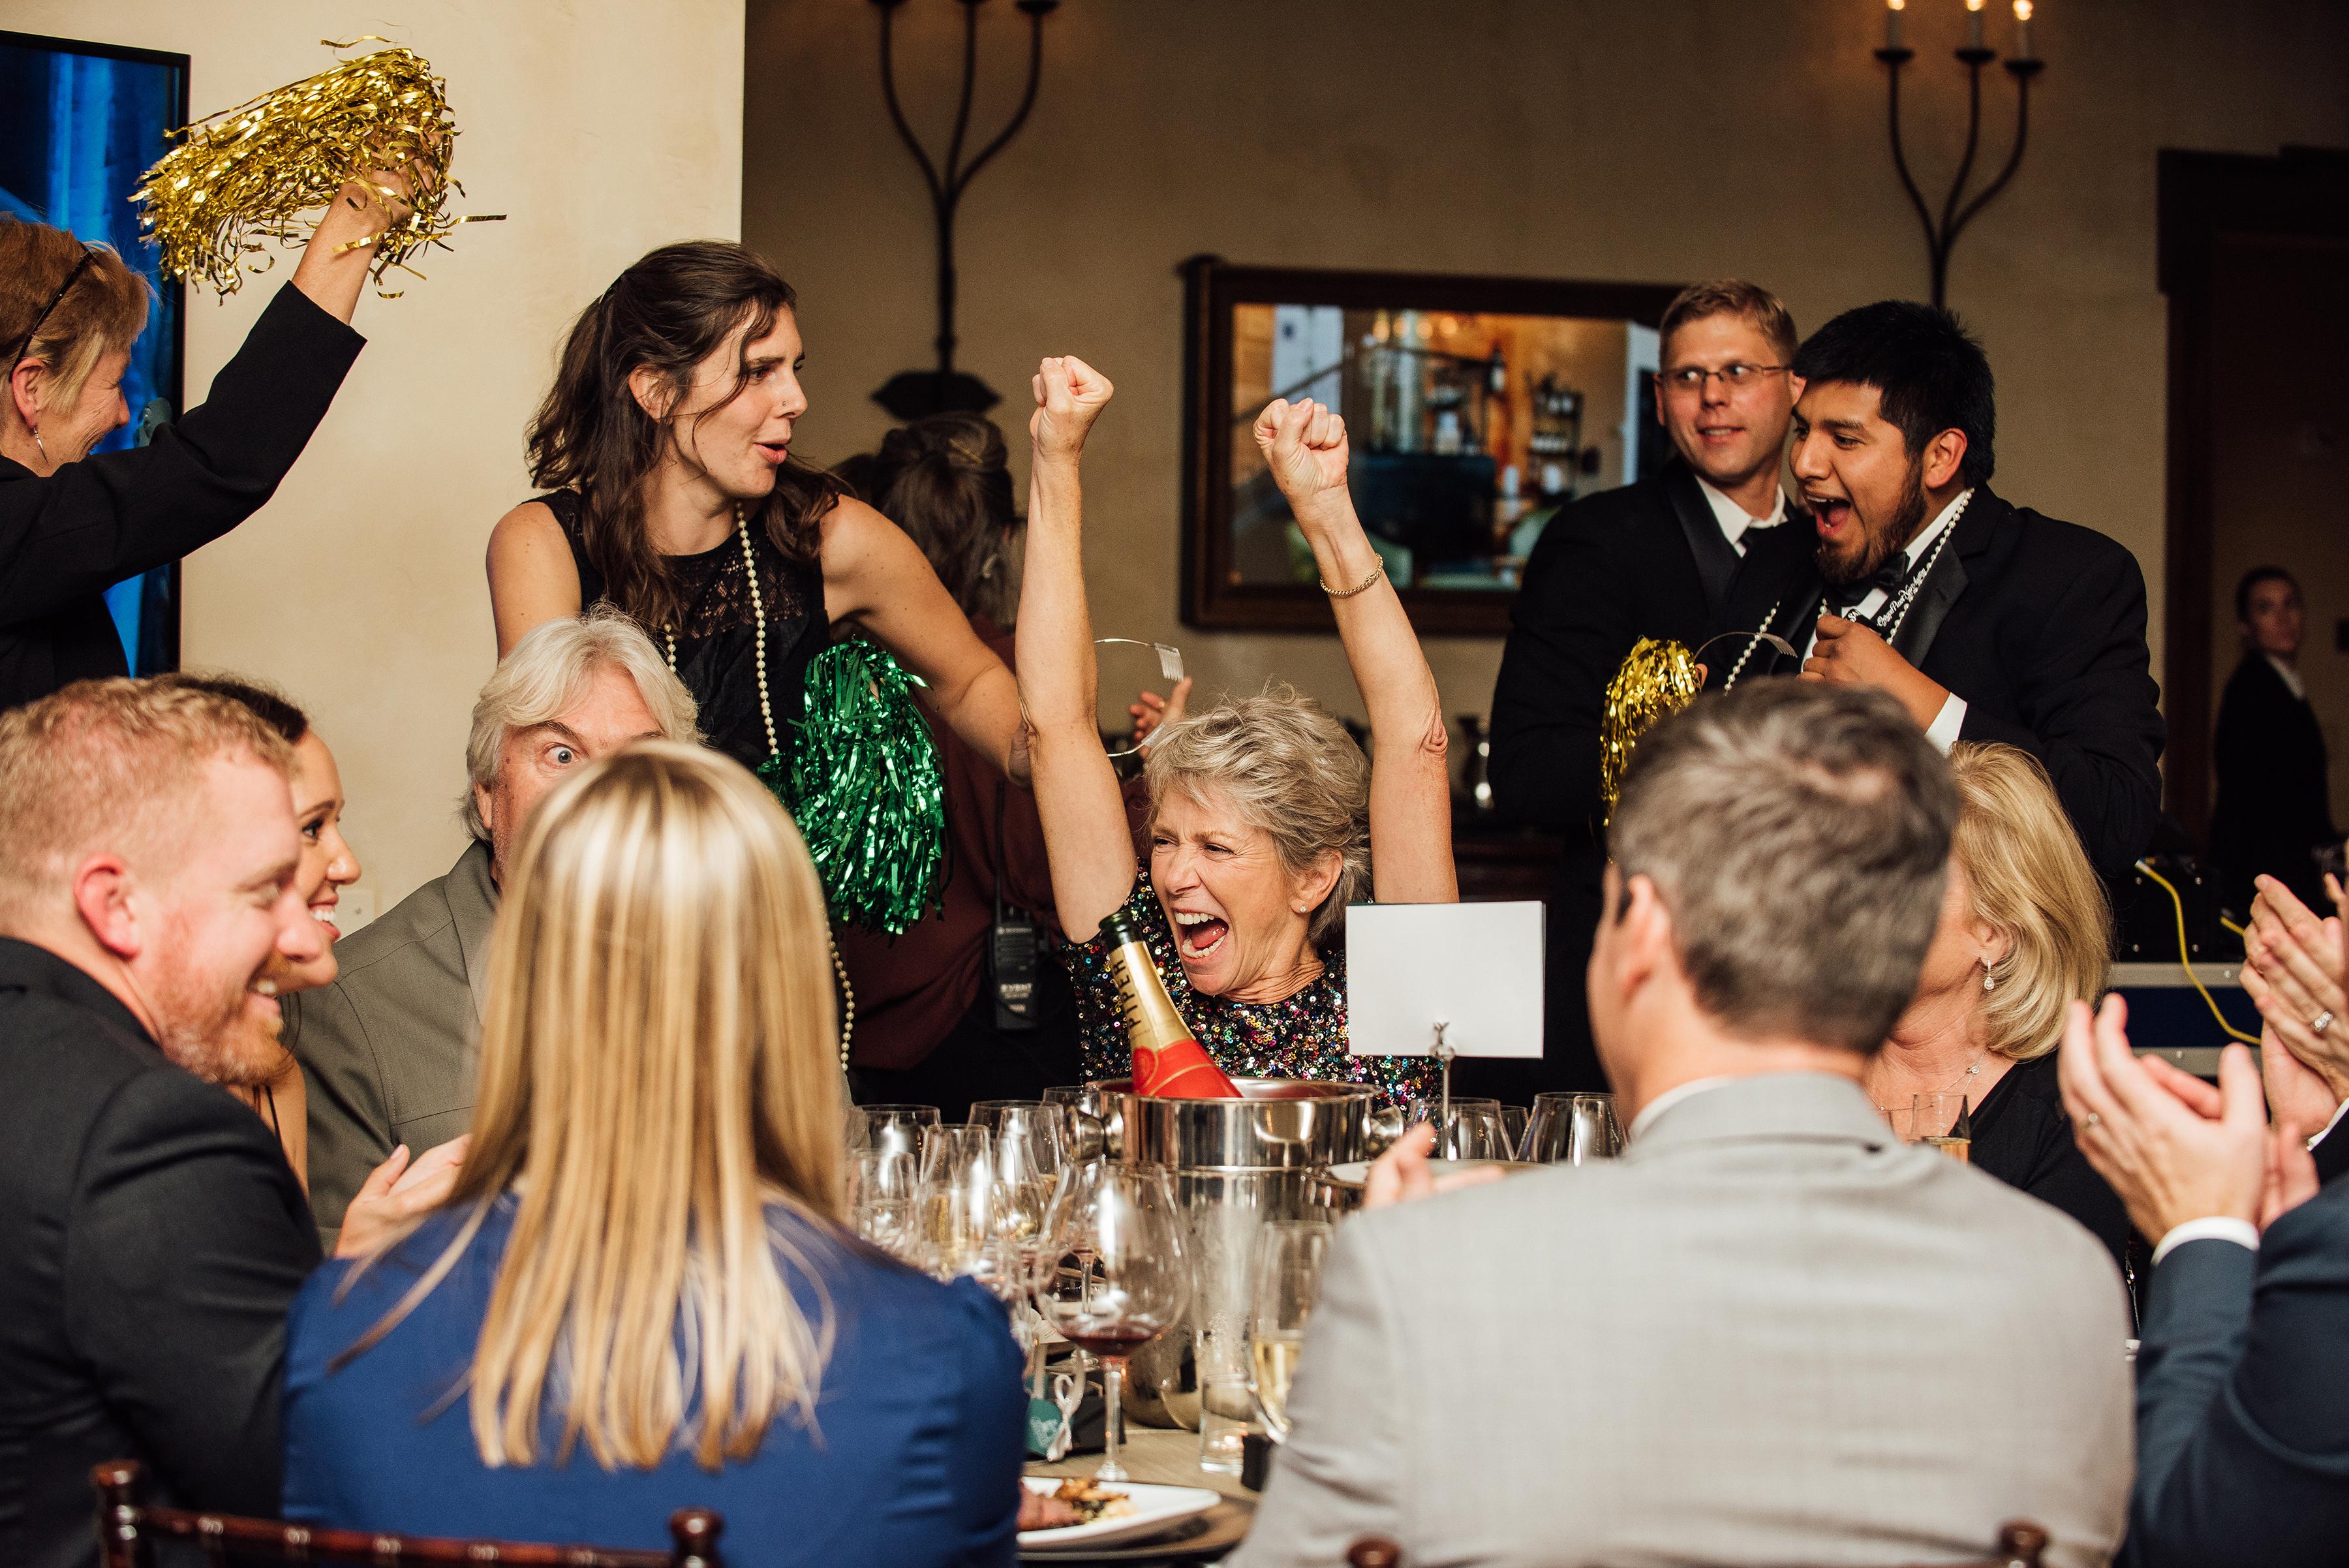 ¡Salud! Premiere Pinot Noir Wine Auction raises funds for their migrant healthcare program.